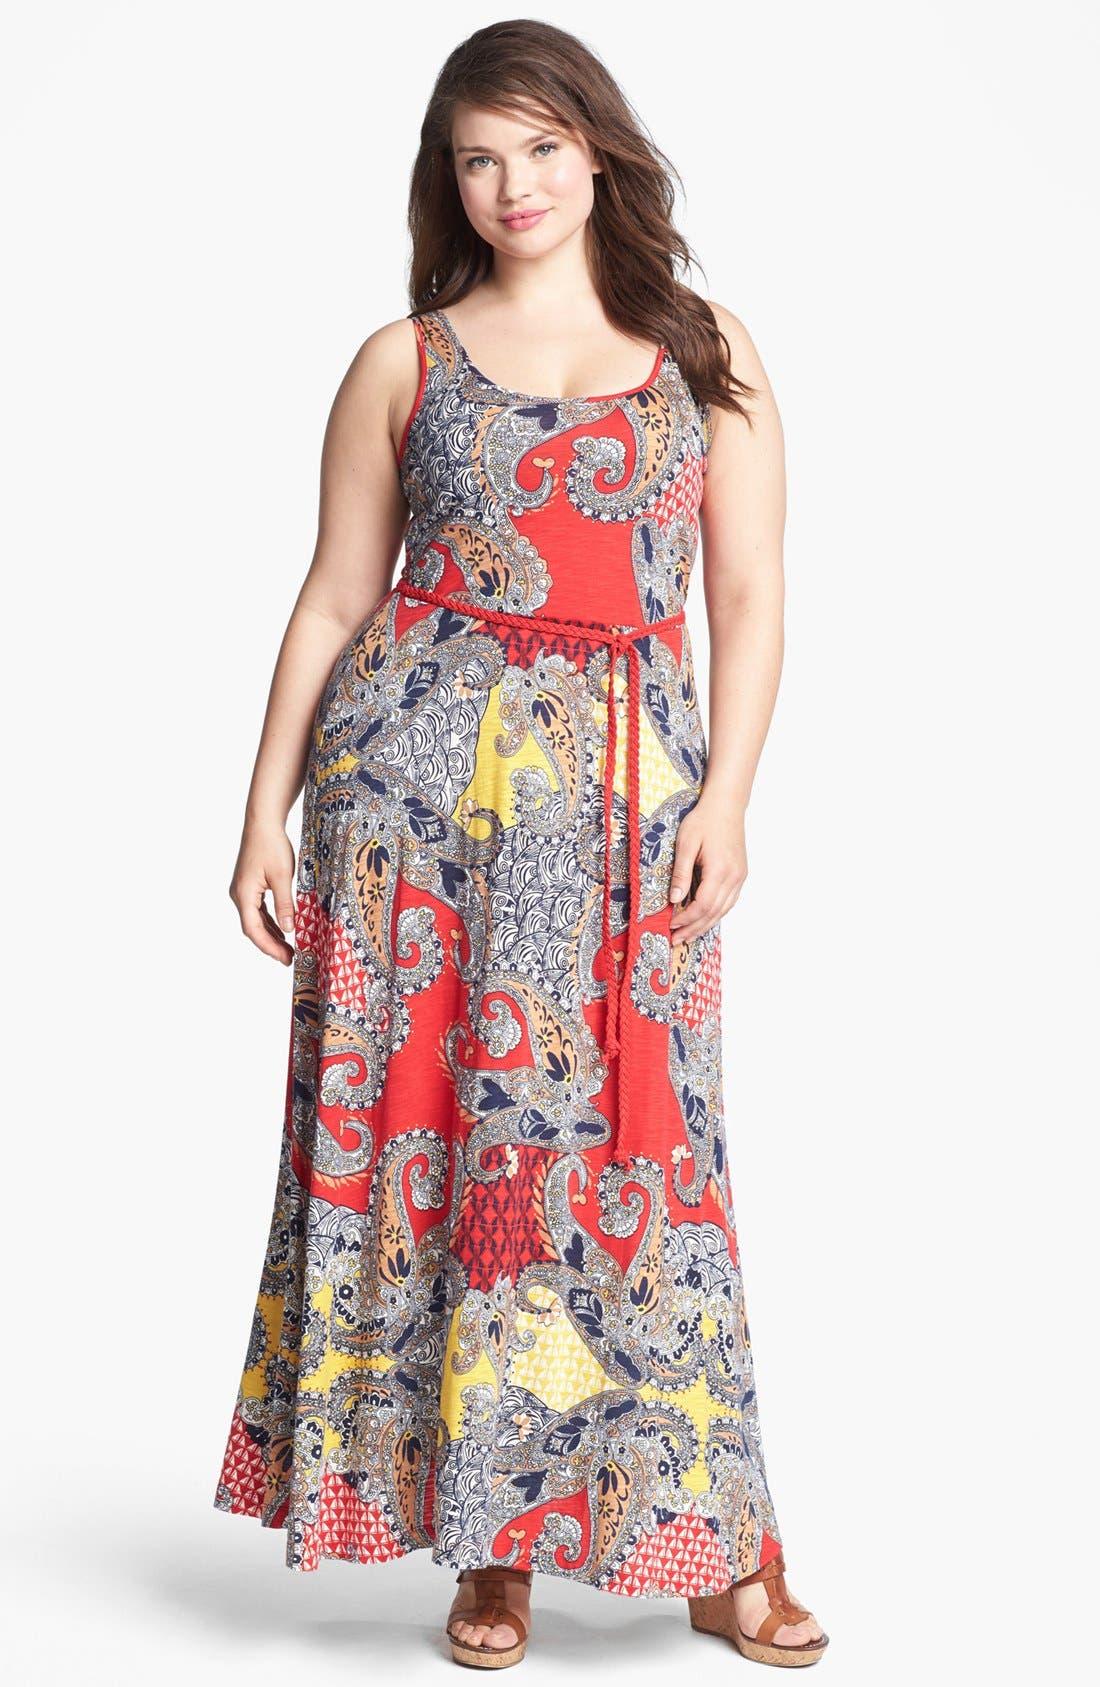 Alternate Image 1 Selected - Lucky Brand 'Marrakesh' Paisley Print Maxi Dress (Plus Size)